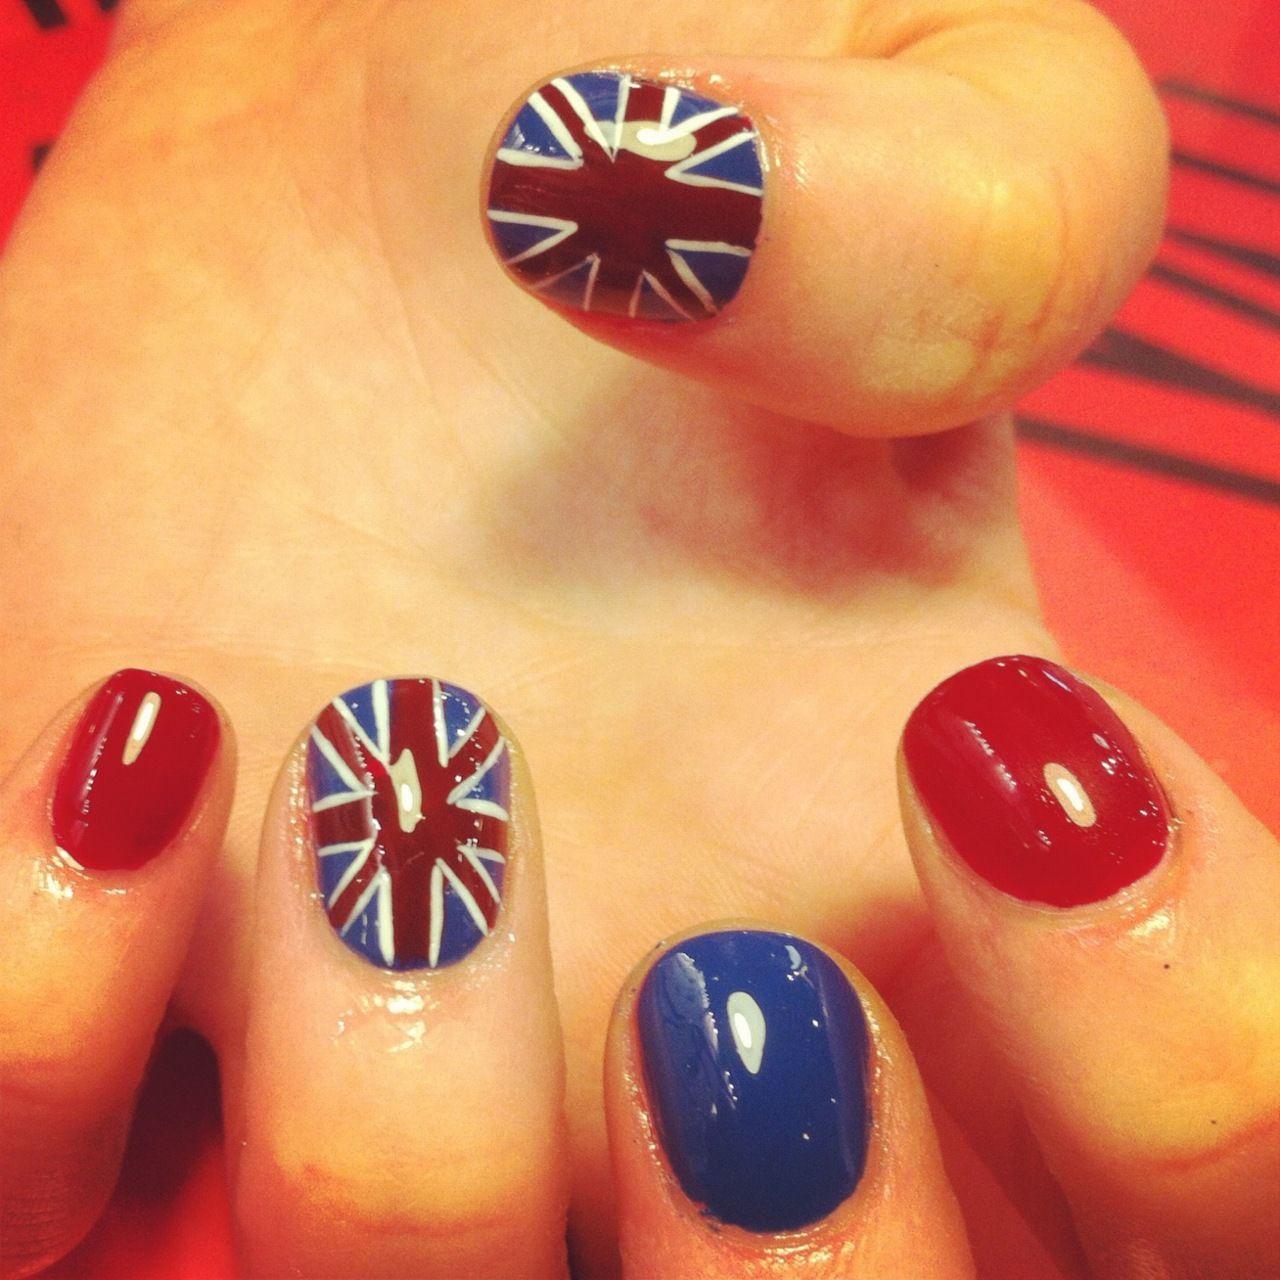 Union Jack | Nail Art | Pinterest | Union jack nails, Country nails ...